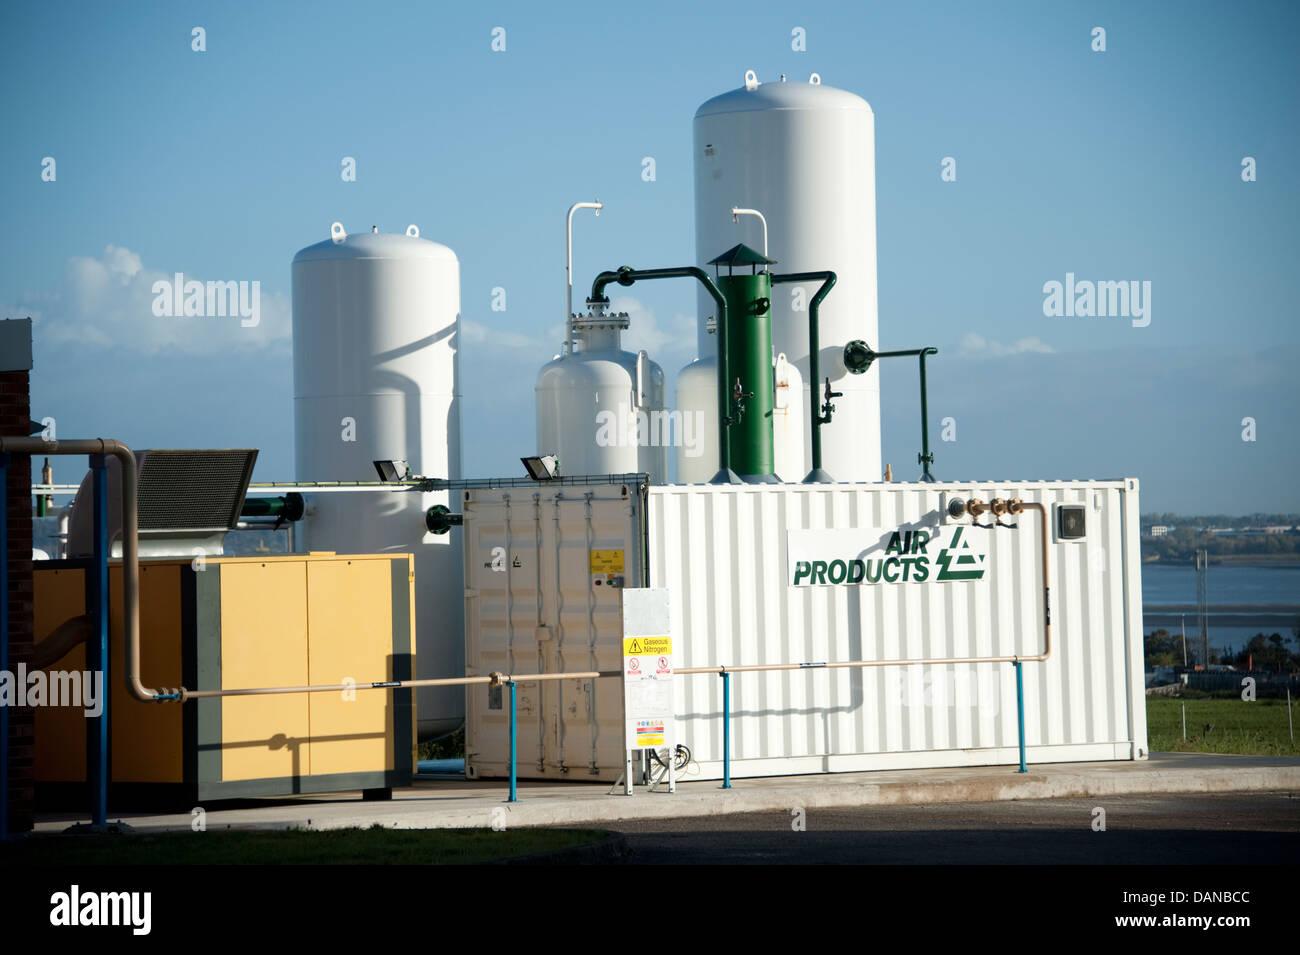 Air Products Compressor Liquid Oxygen Storage Tanks Stock